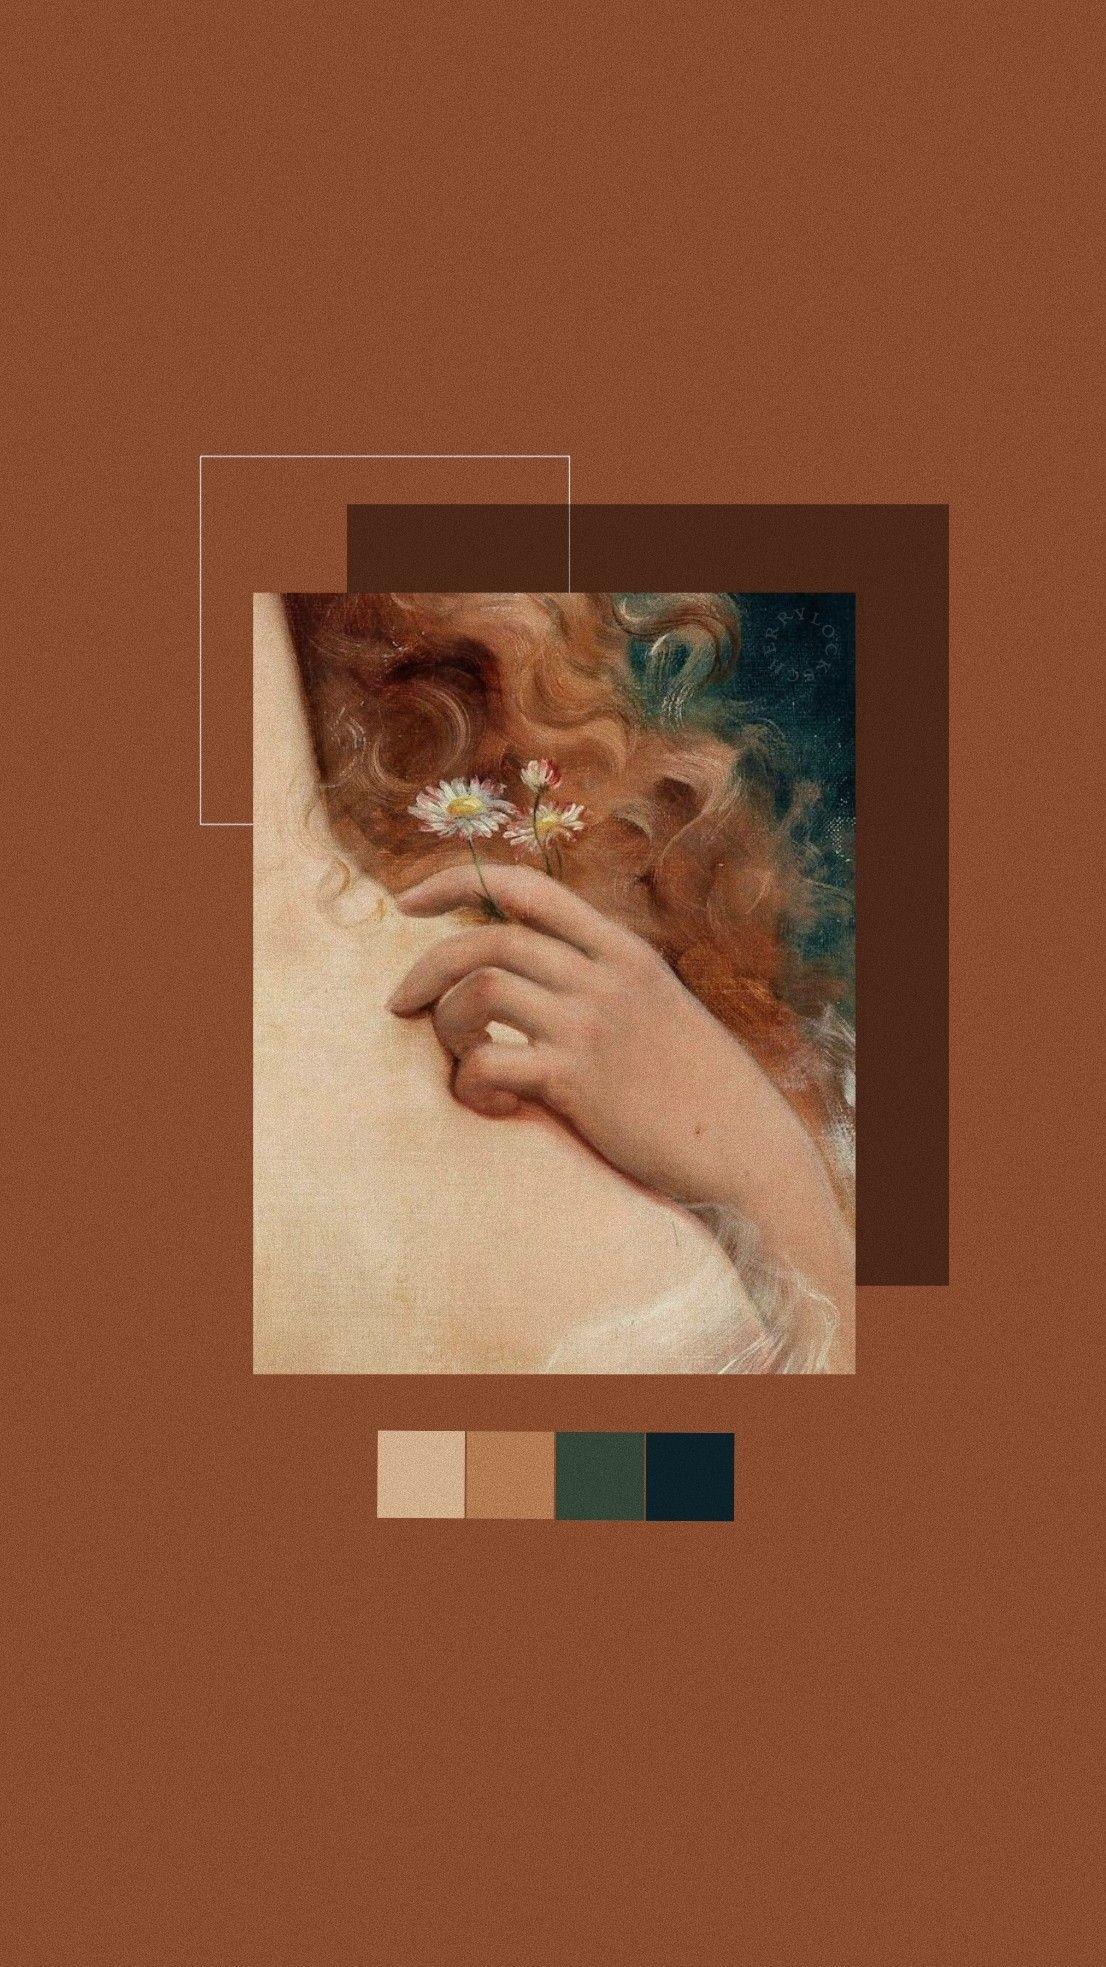 Lockscreen Brown Art Venus 𝚟𝚎𝚛𝚛𝚒𝚗𝚞𝚜 Papel De